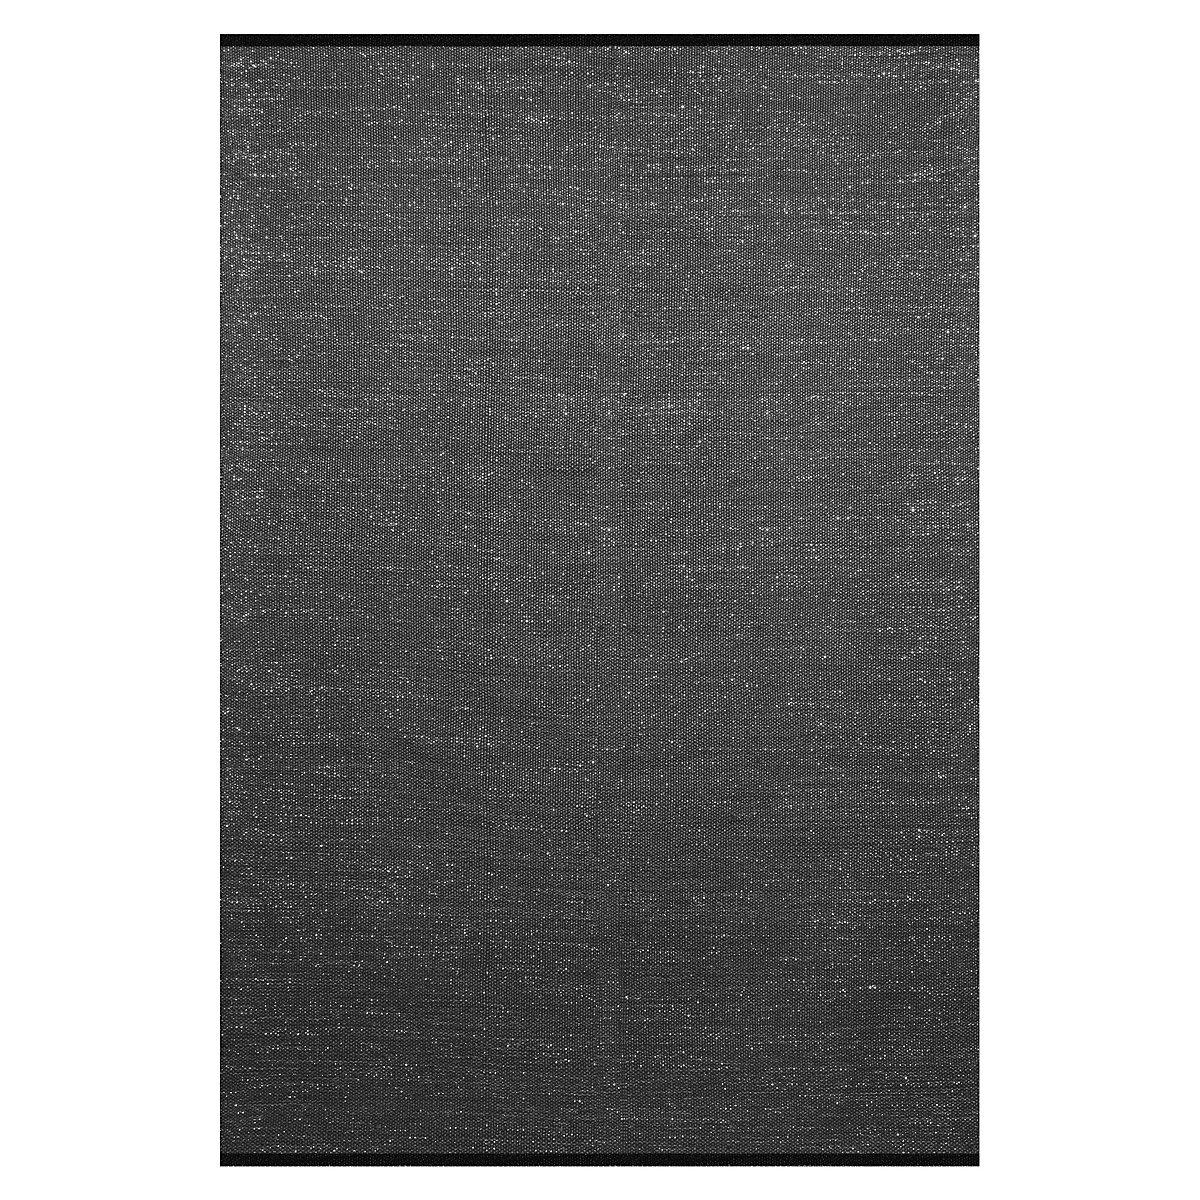 Sparkle Dark Gray 5x8 Area Rug